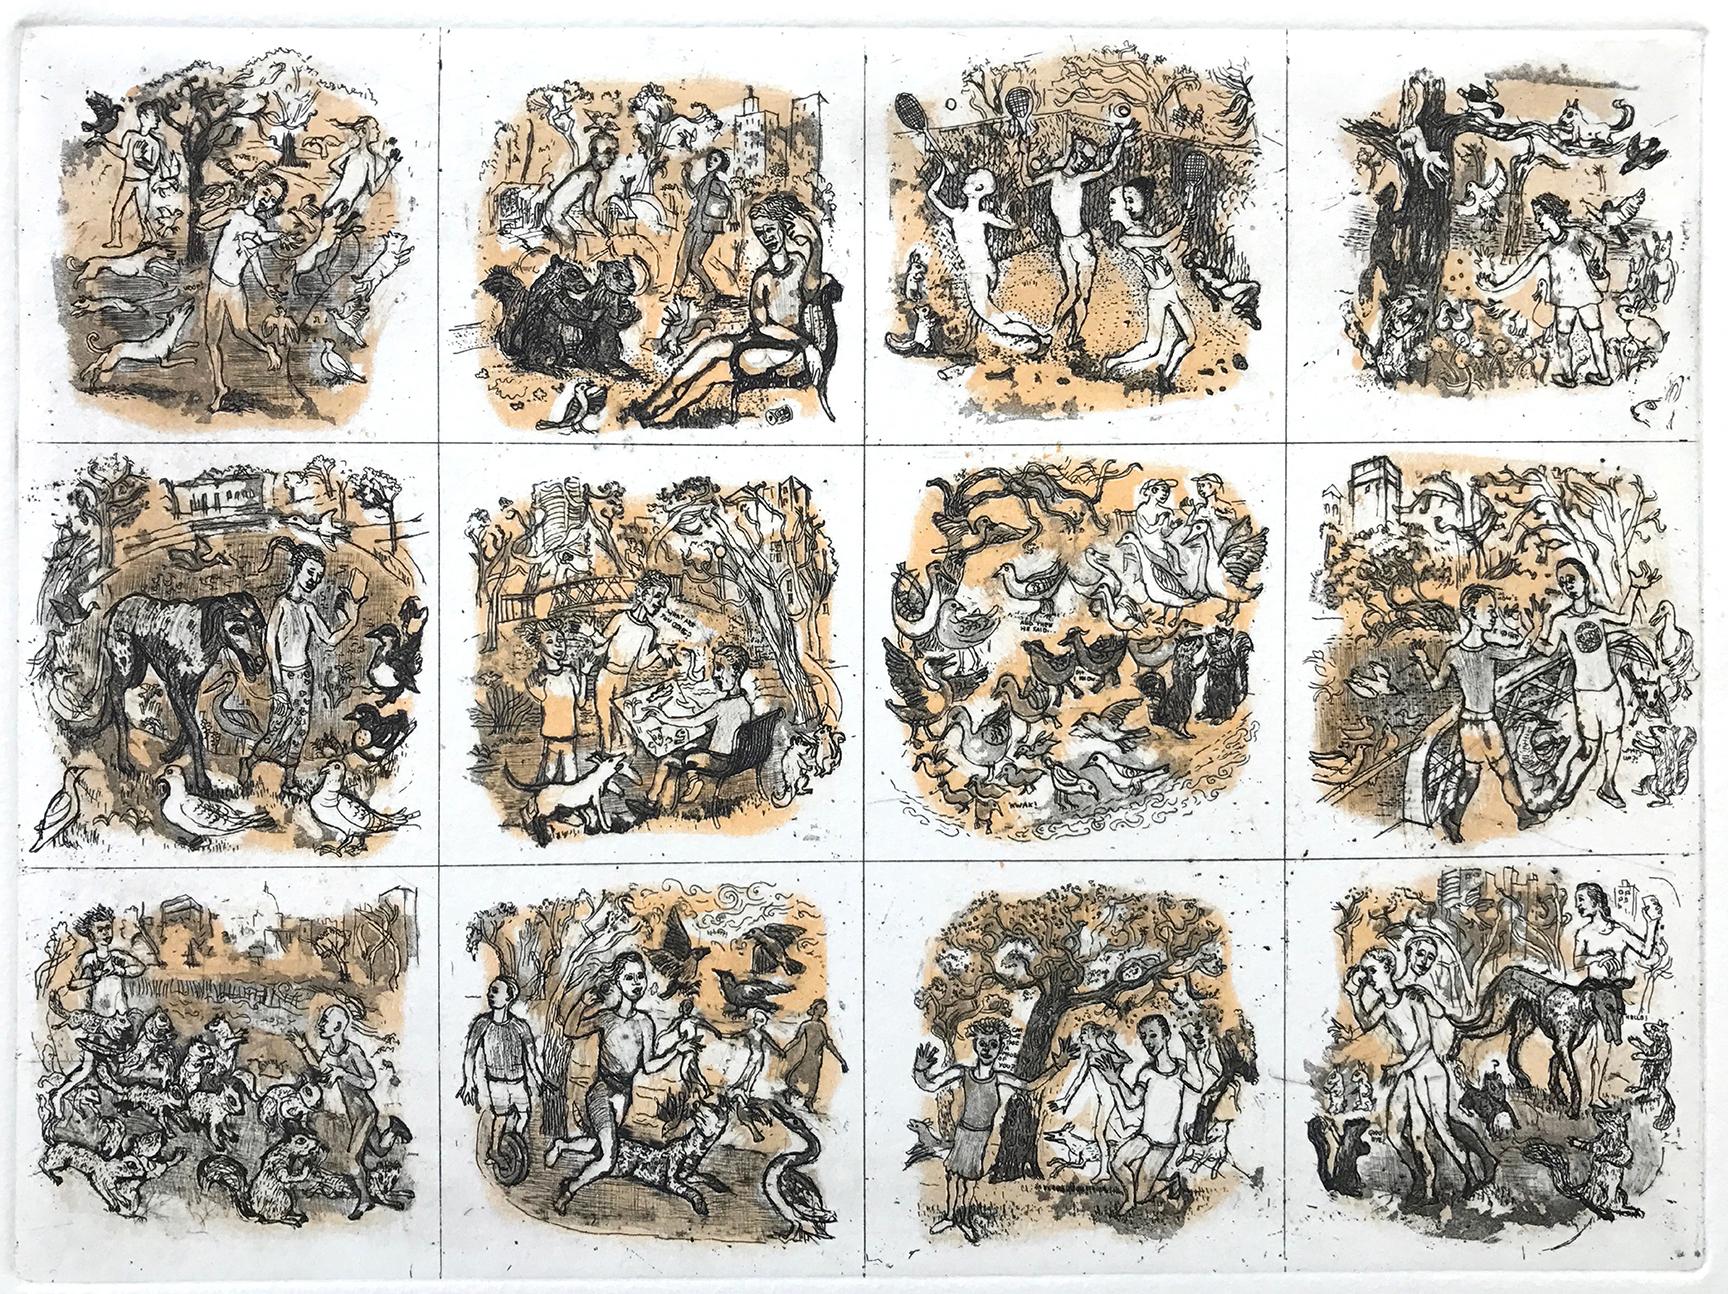 james boyd brent vignettes1 small - Copy.jpg